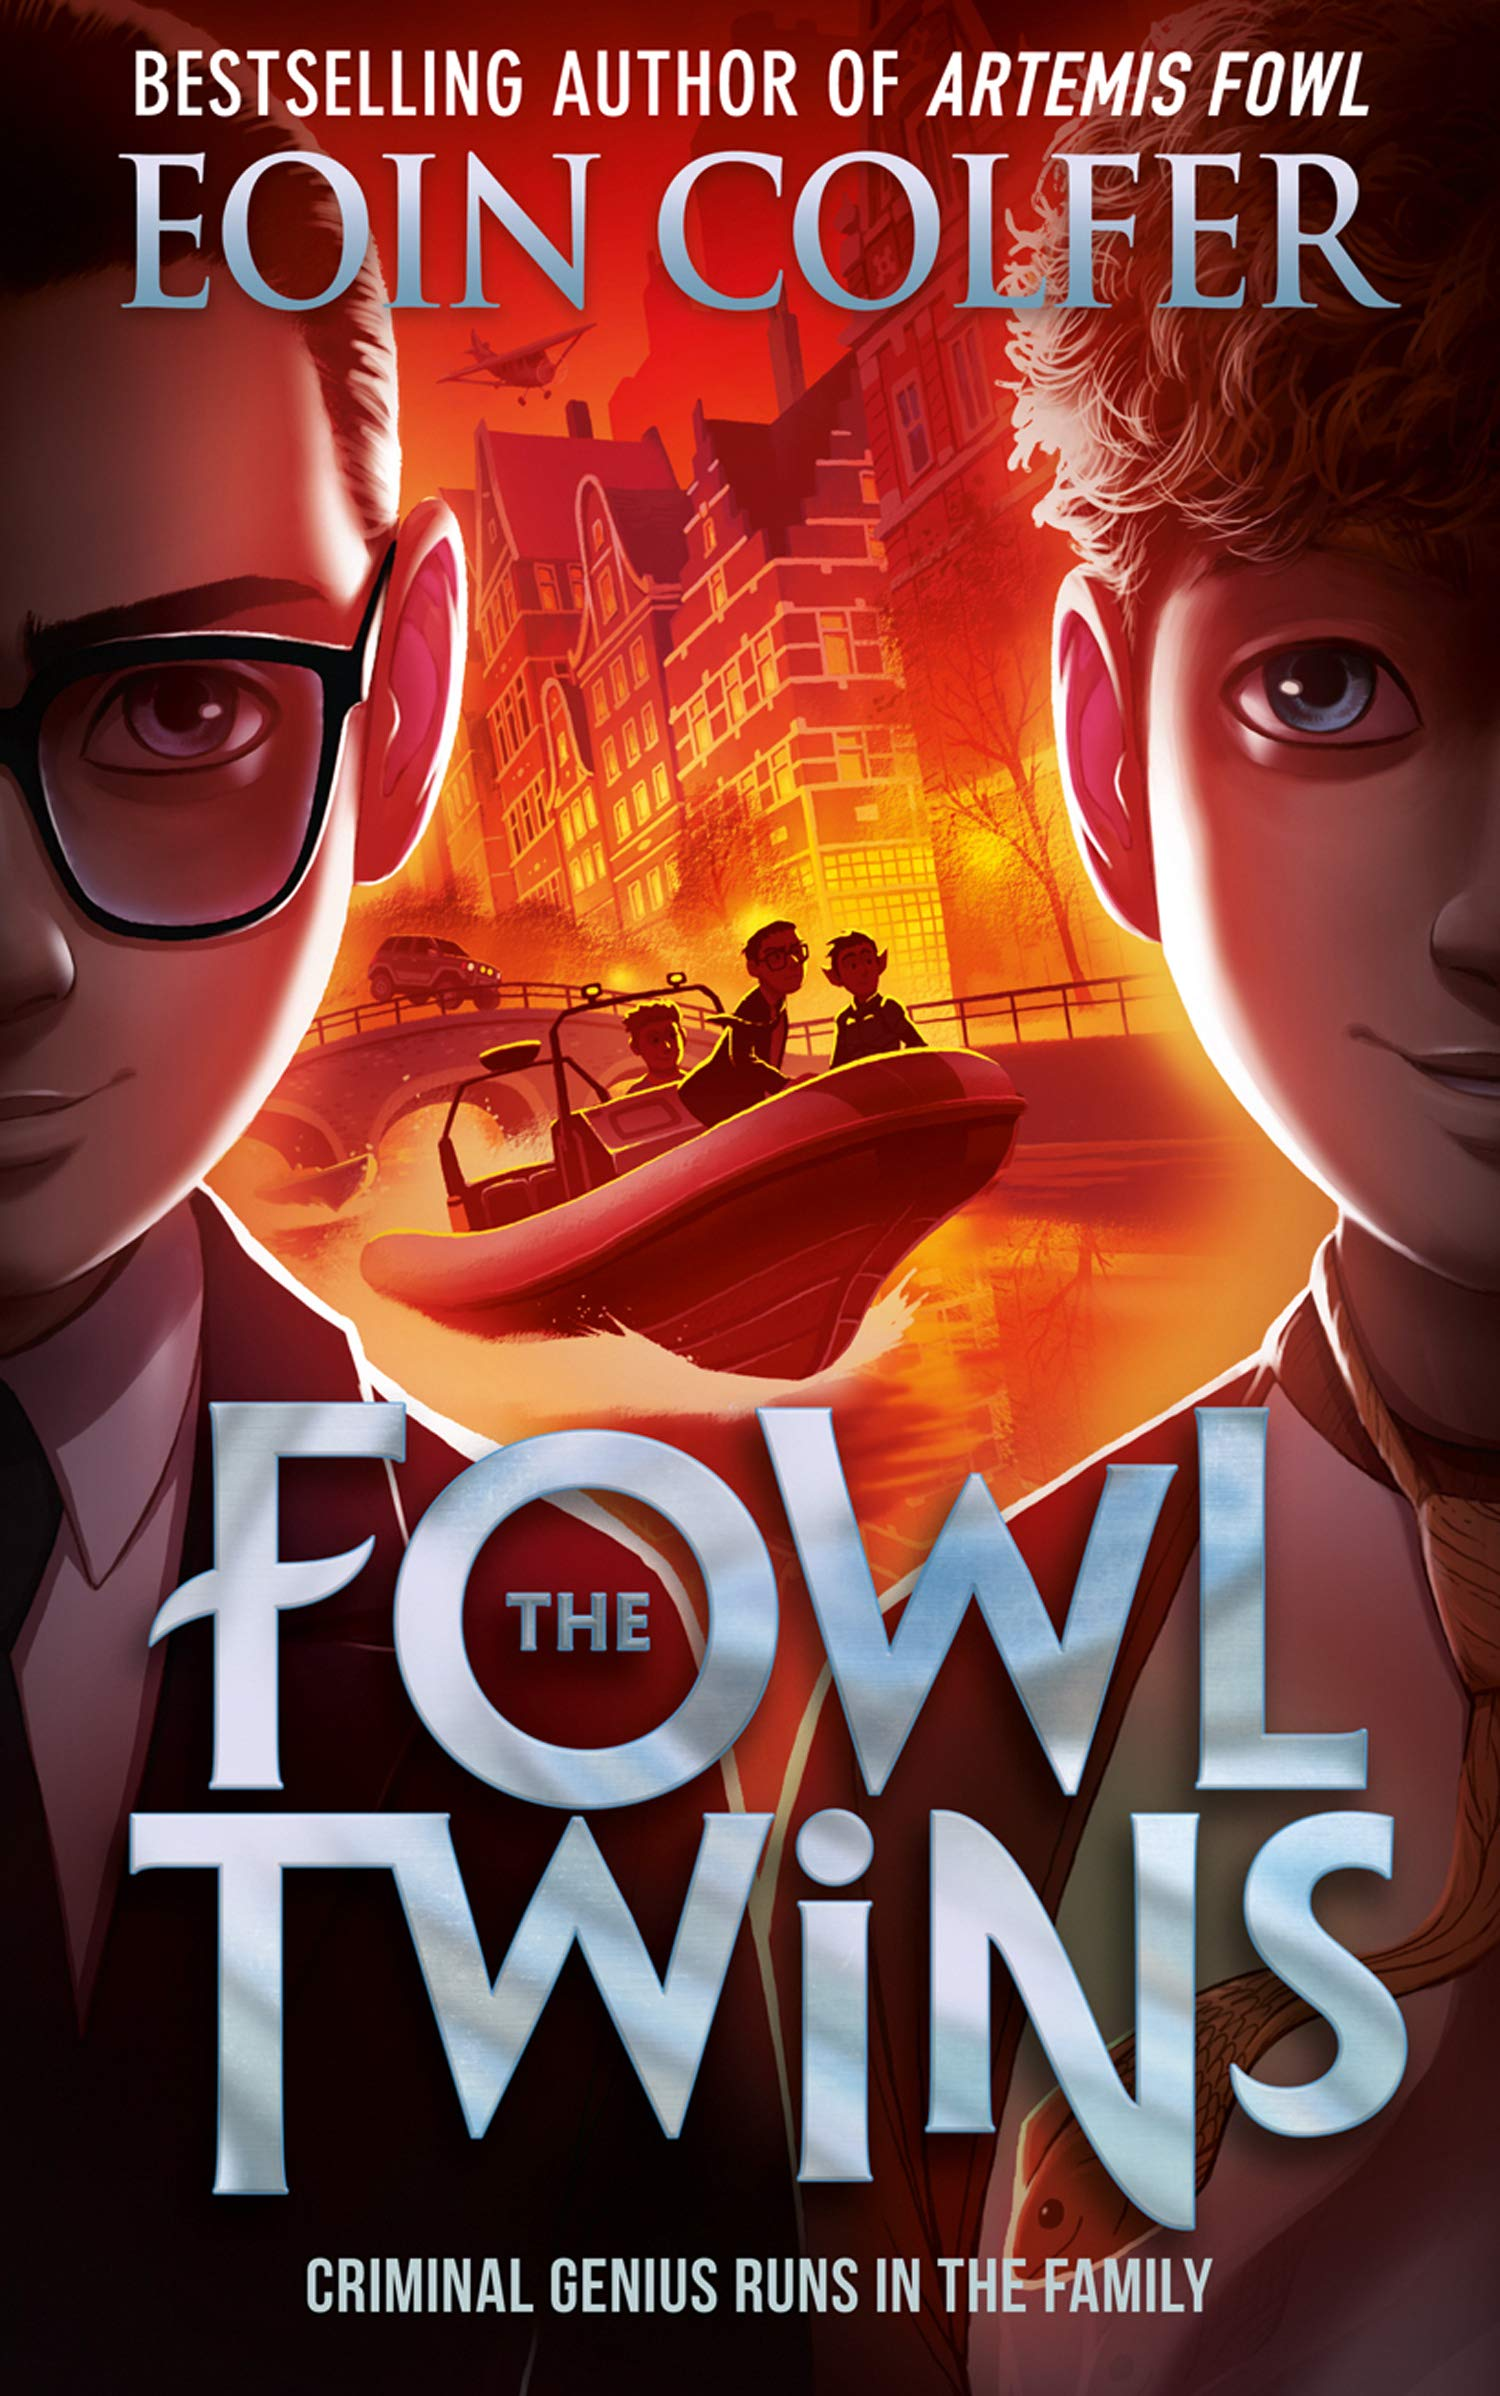 The Fowl Twins por Eoin Colfer